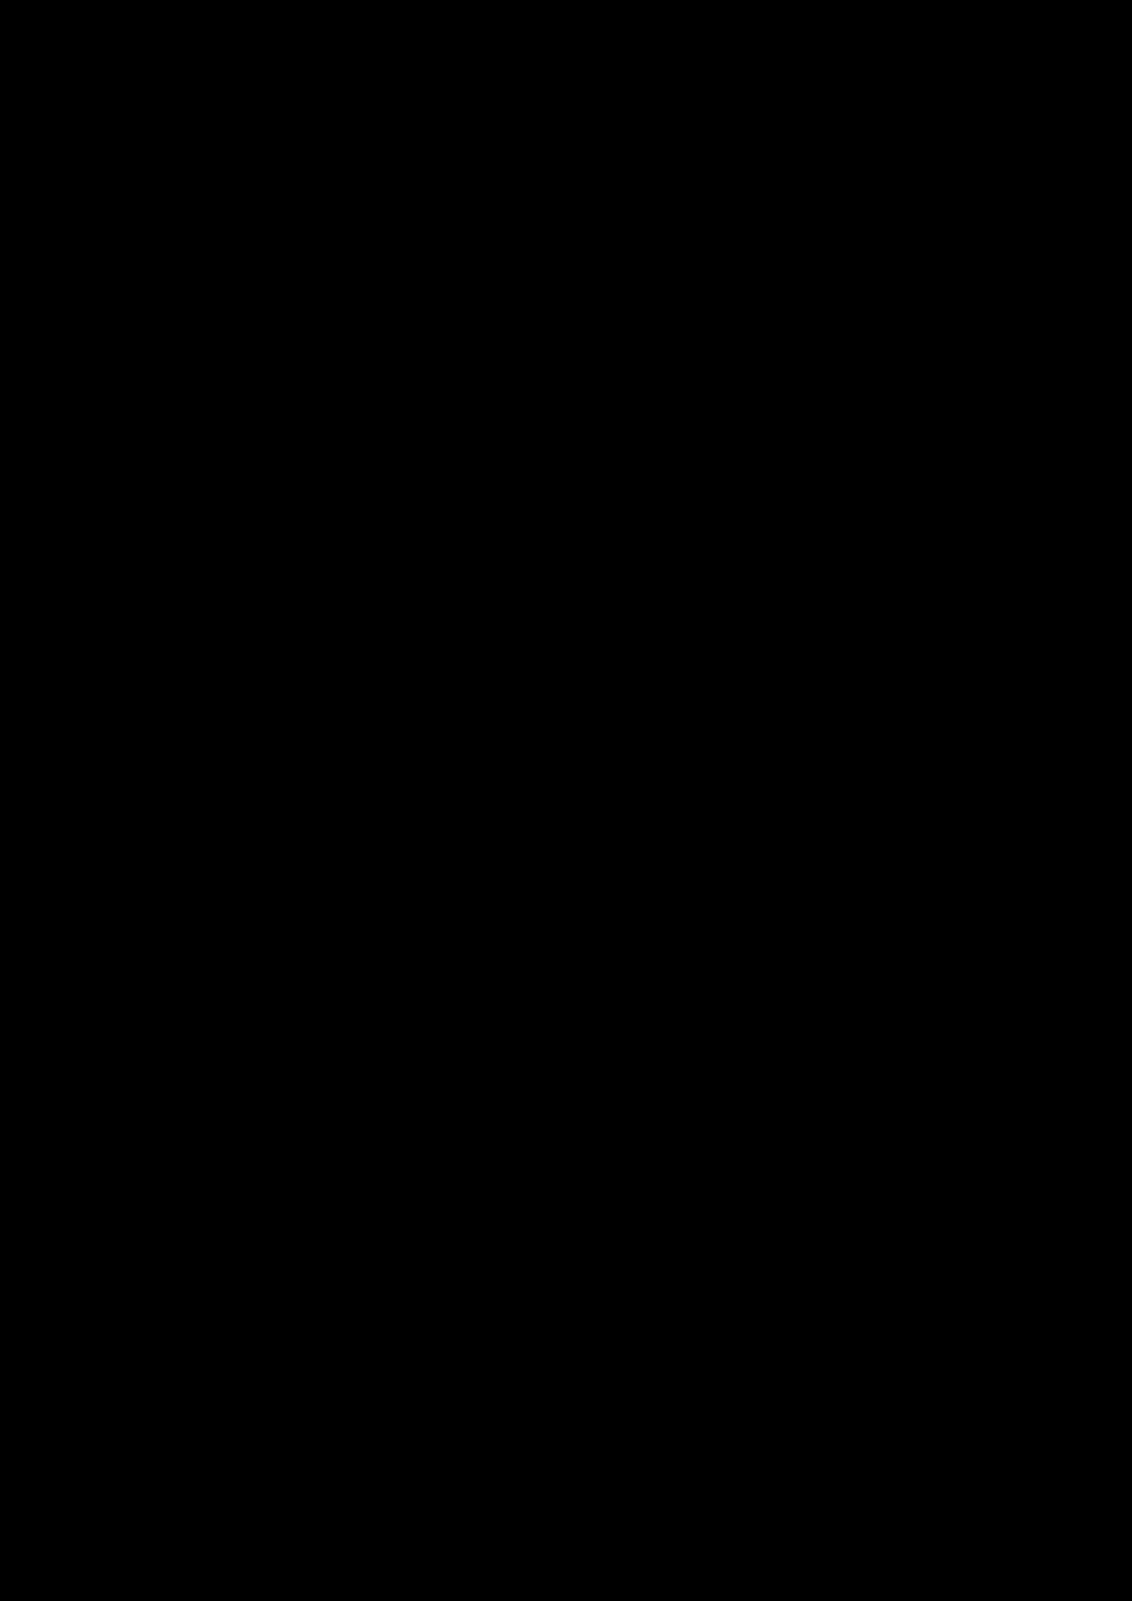 Prosti slide, Image 24